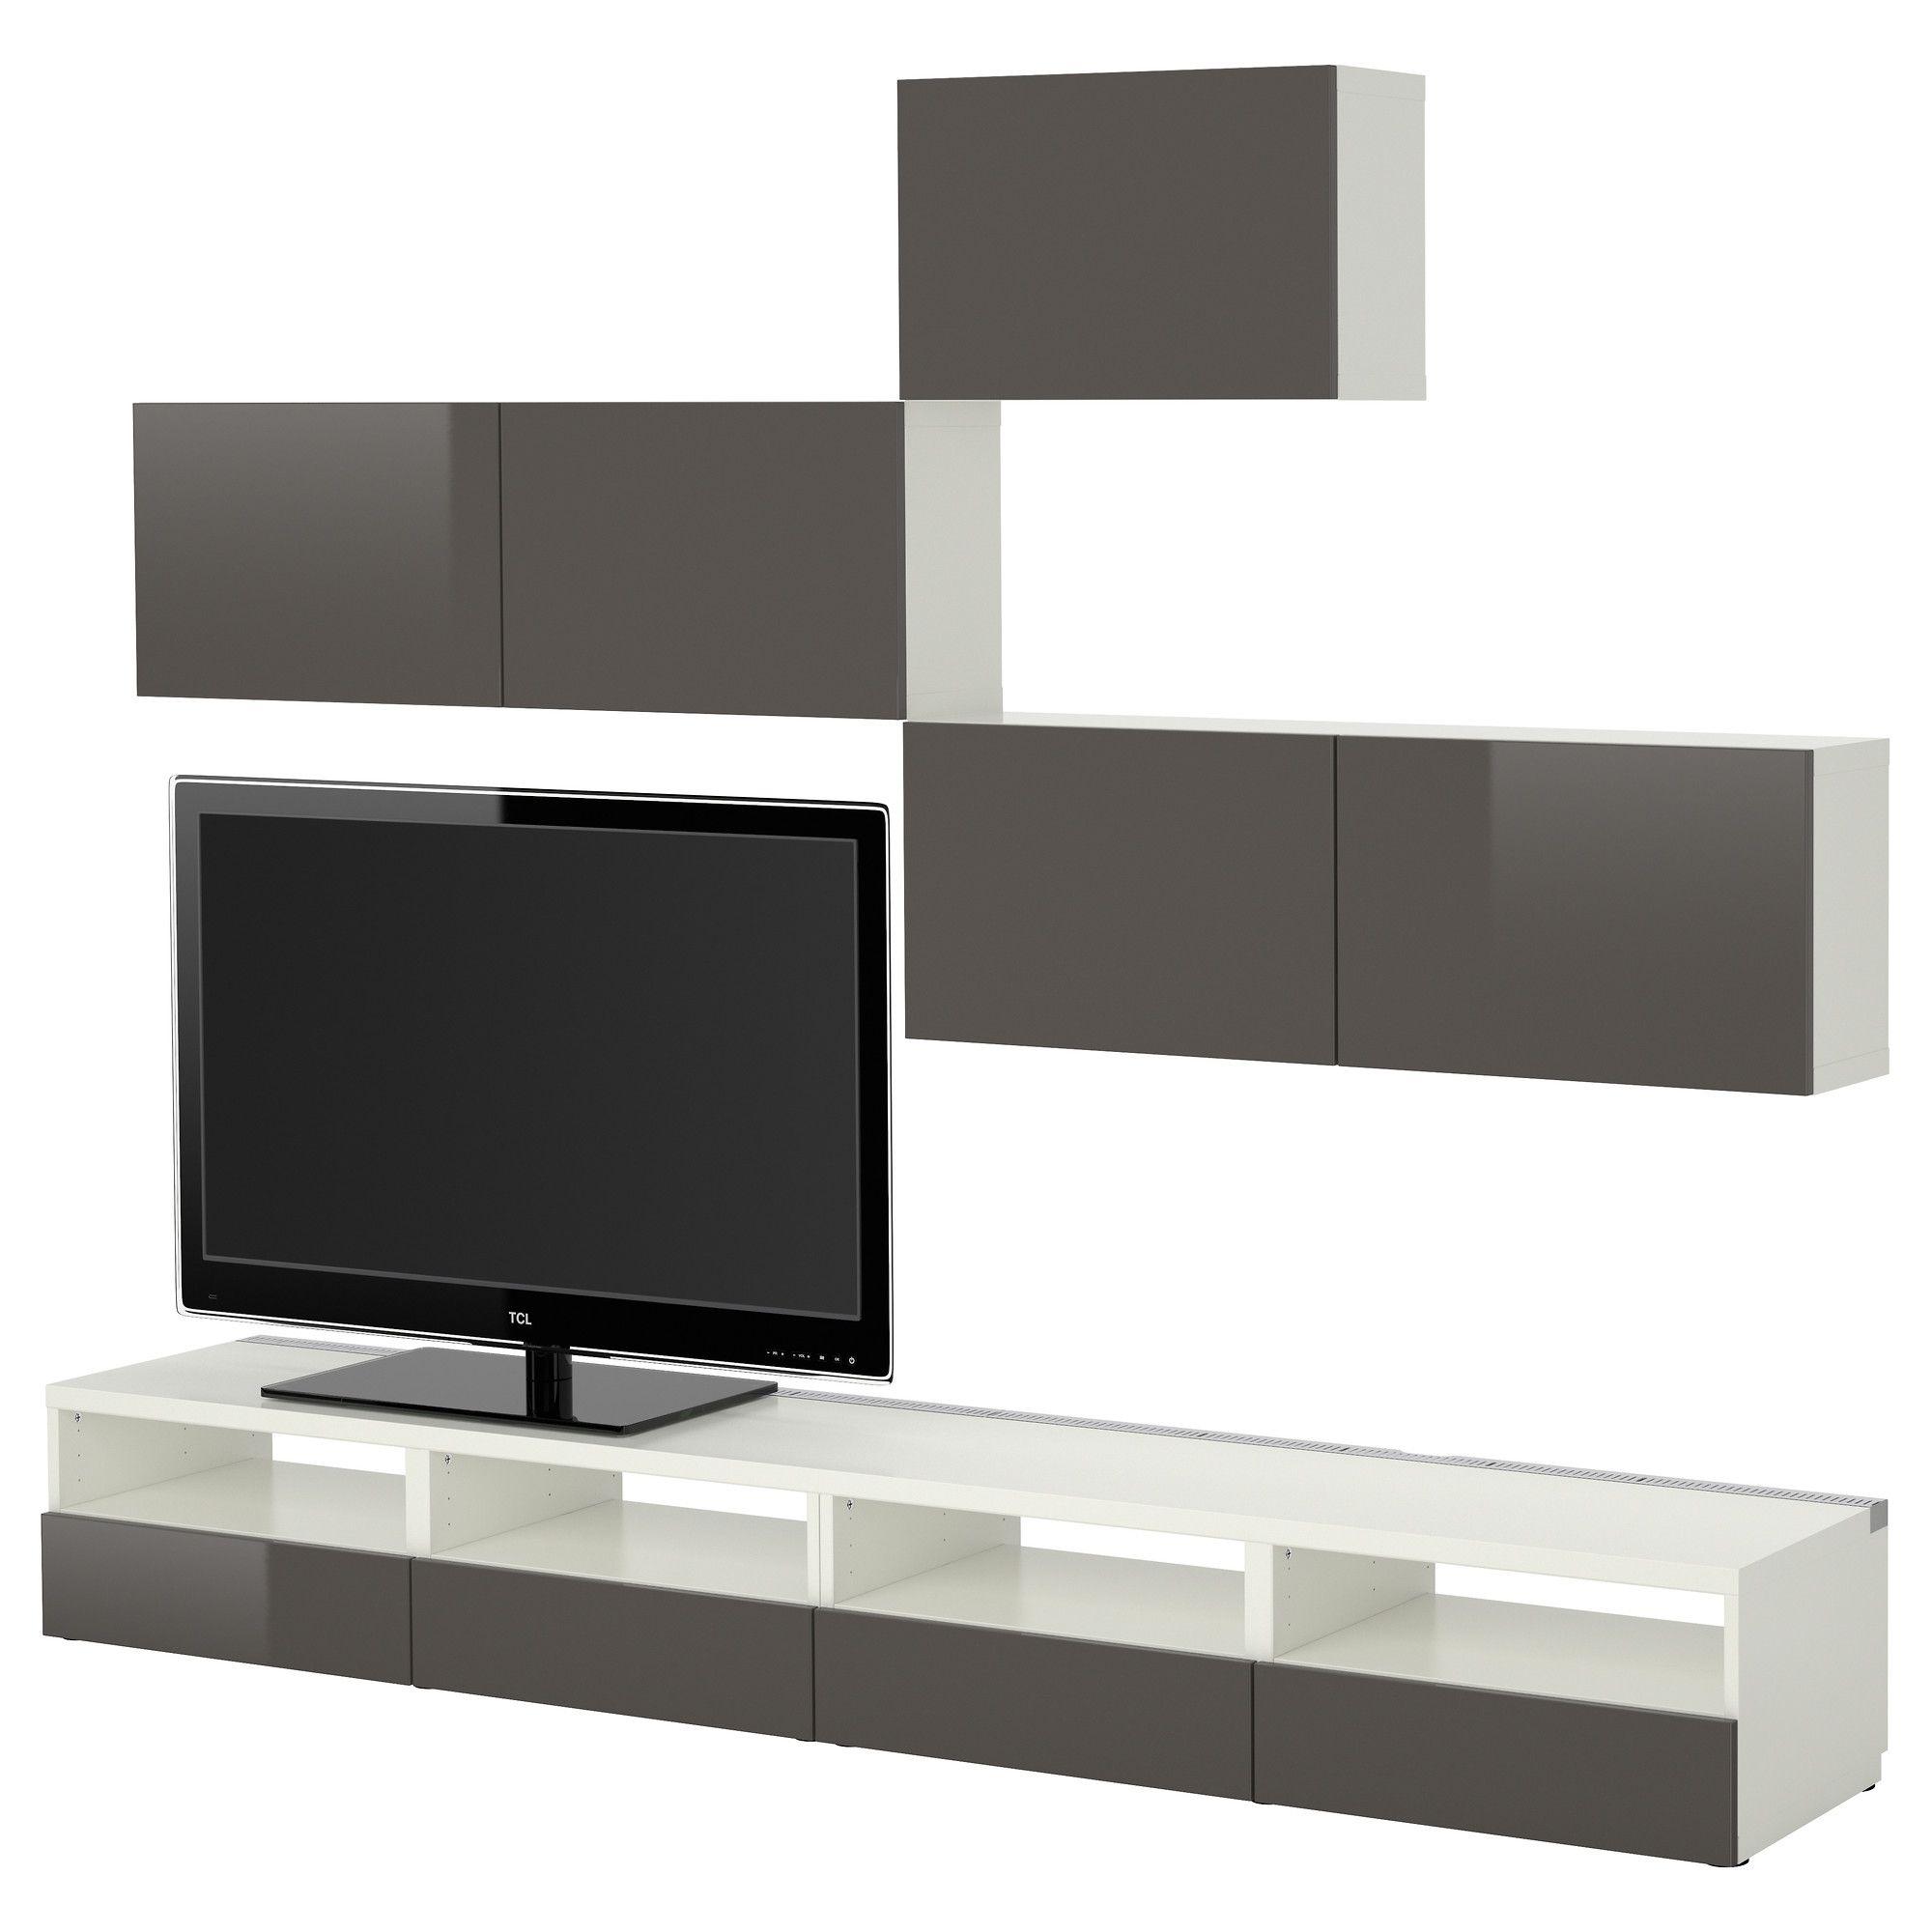 BESTÅ TV Storage Combination   White/Tofta High Gloss/gray   IKEA Tv